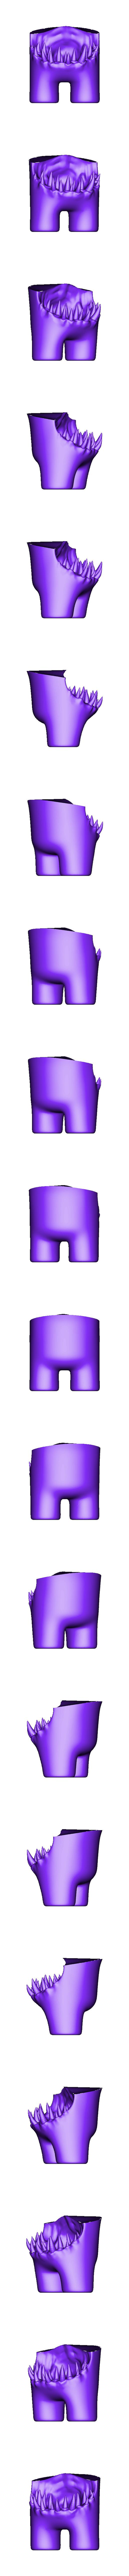 impostBodyDown.obj Download free OBJ file Among Us (easy print)(crew/body/ghost/impostor) • 3D printable template, devanborkhatria